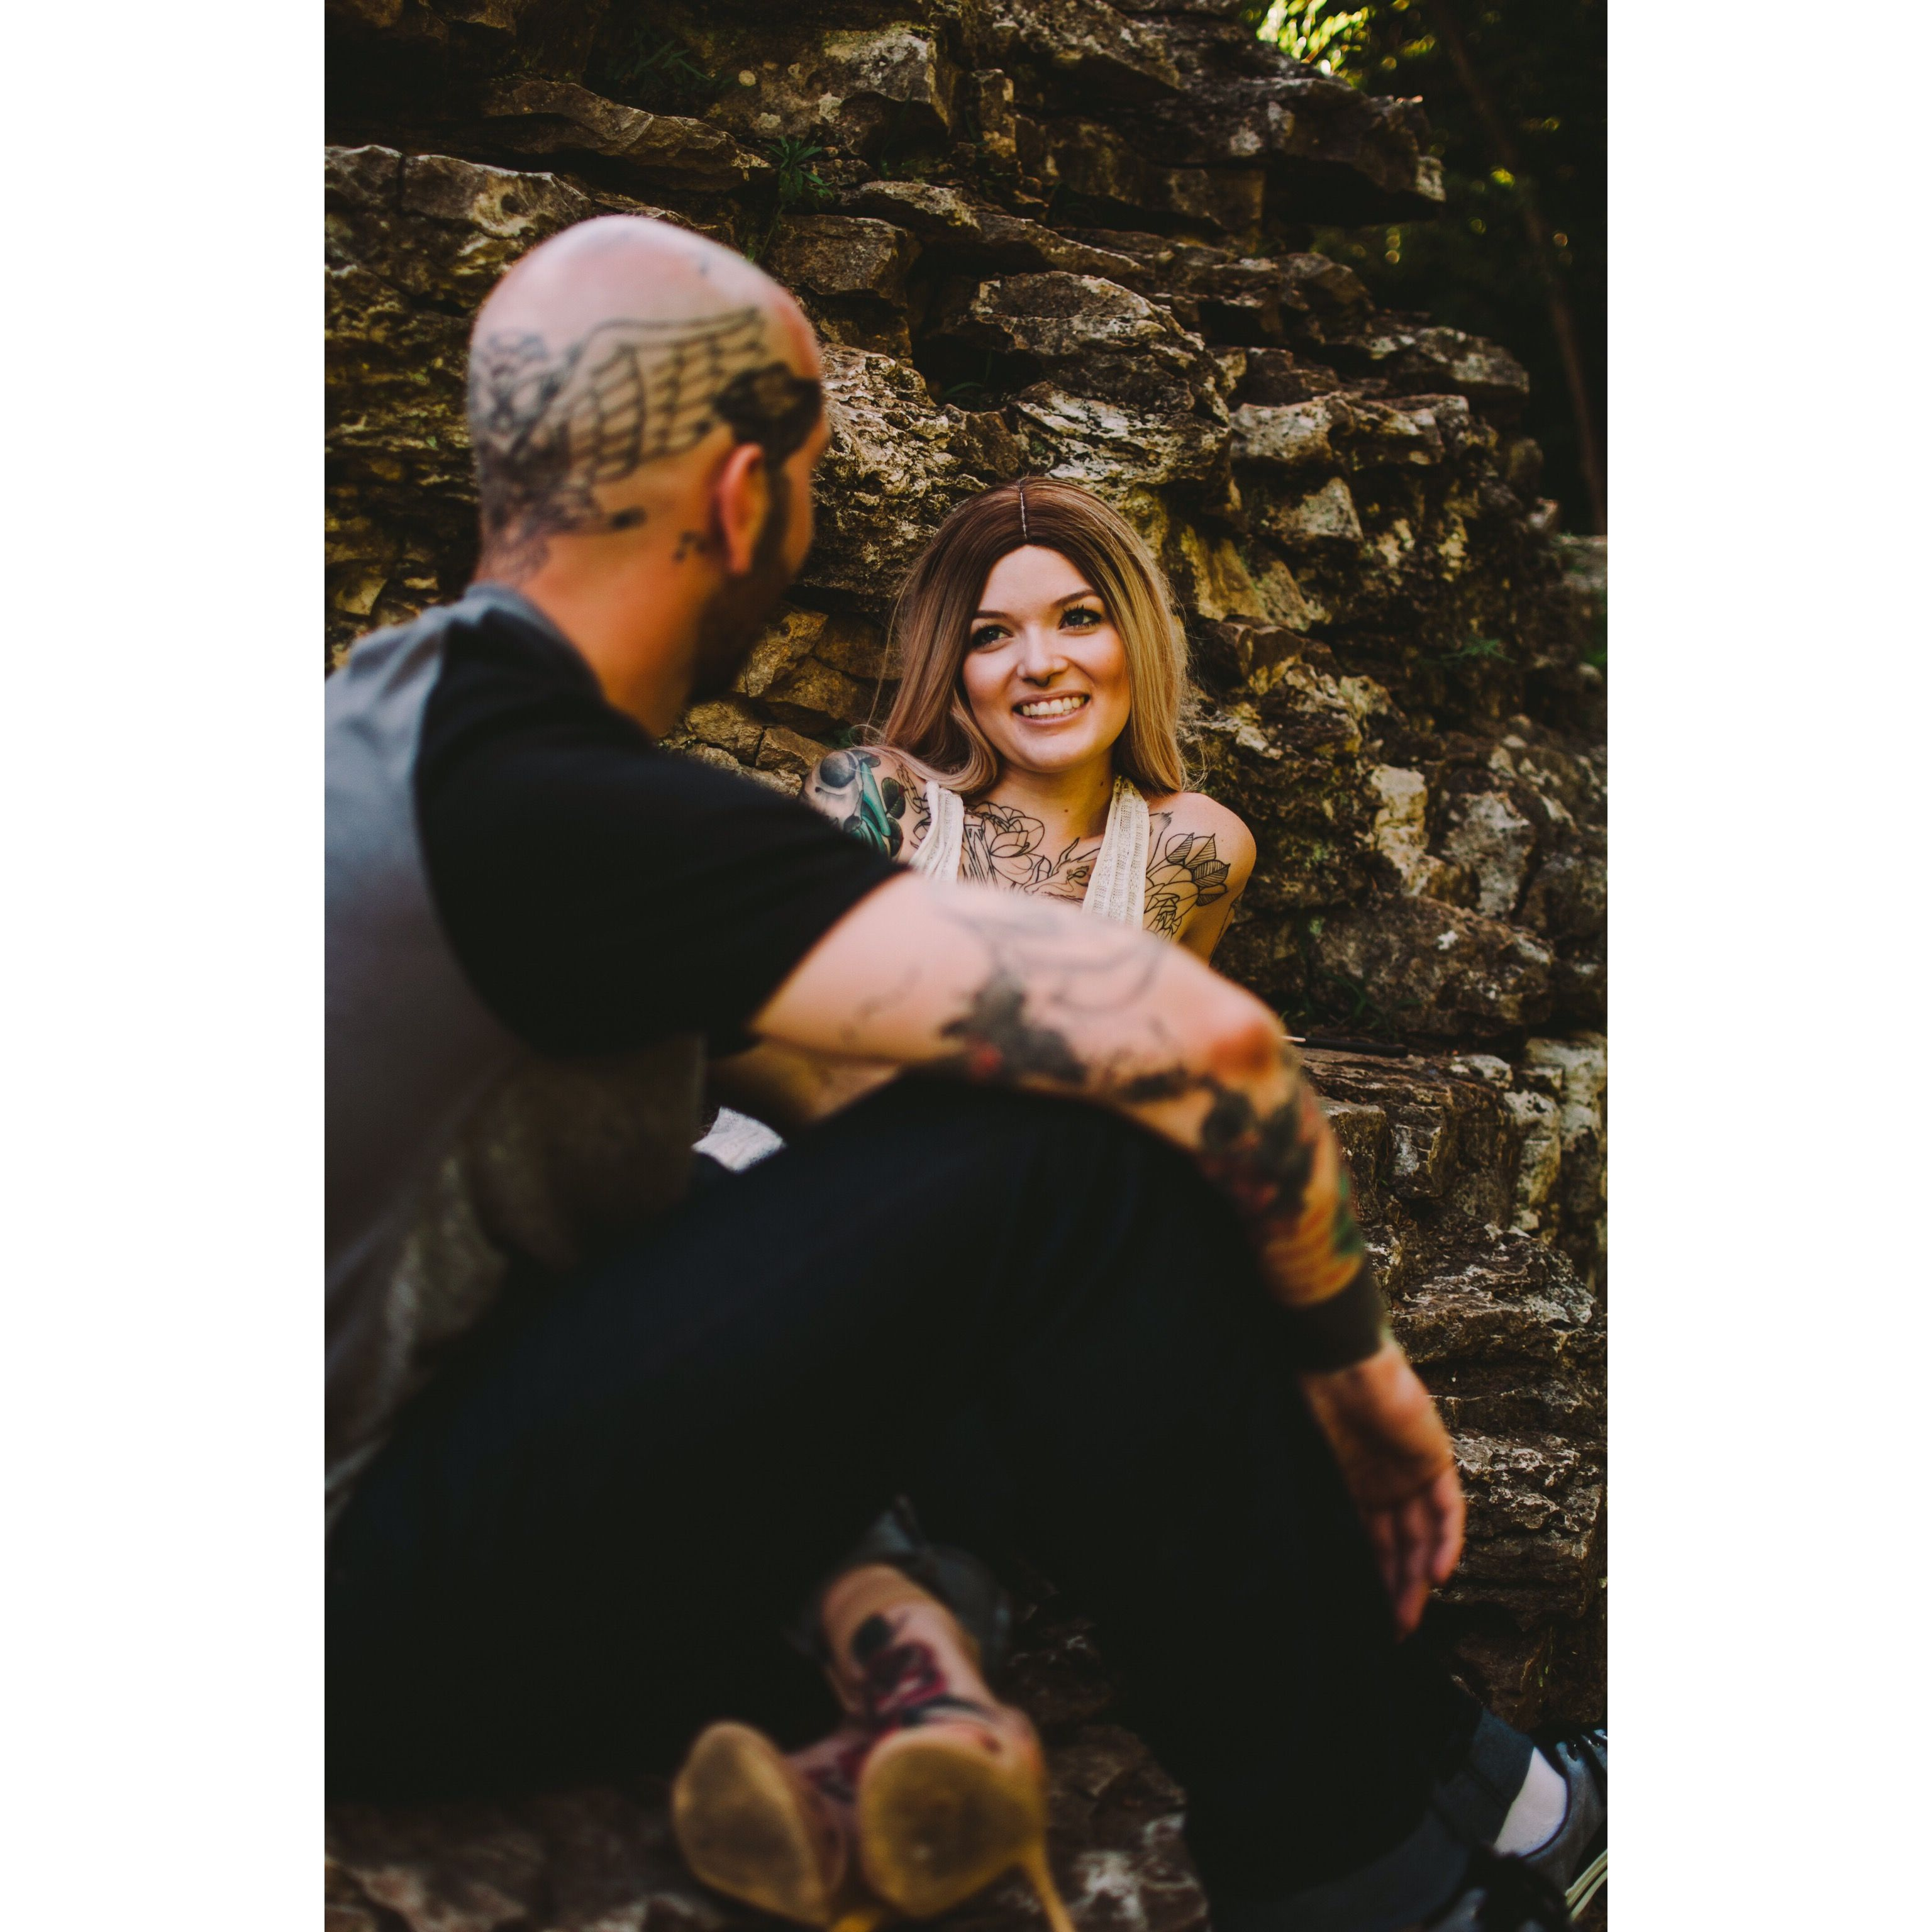 #tattoos #girlswithtattoos #tattoo #couplegoals #coupleswithtattoos #inked #portrait #portraitphotography #portraiture #tattooportrait #tattooed #colortattoos #blackandwhitetattoo #ink #menwithtattoos #boyswithtattoos